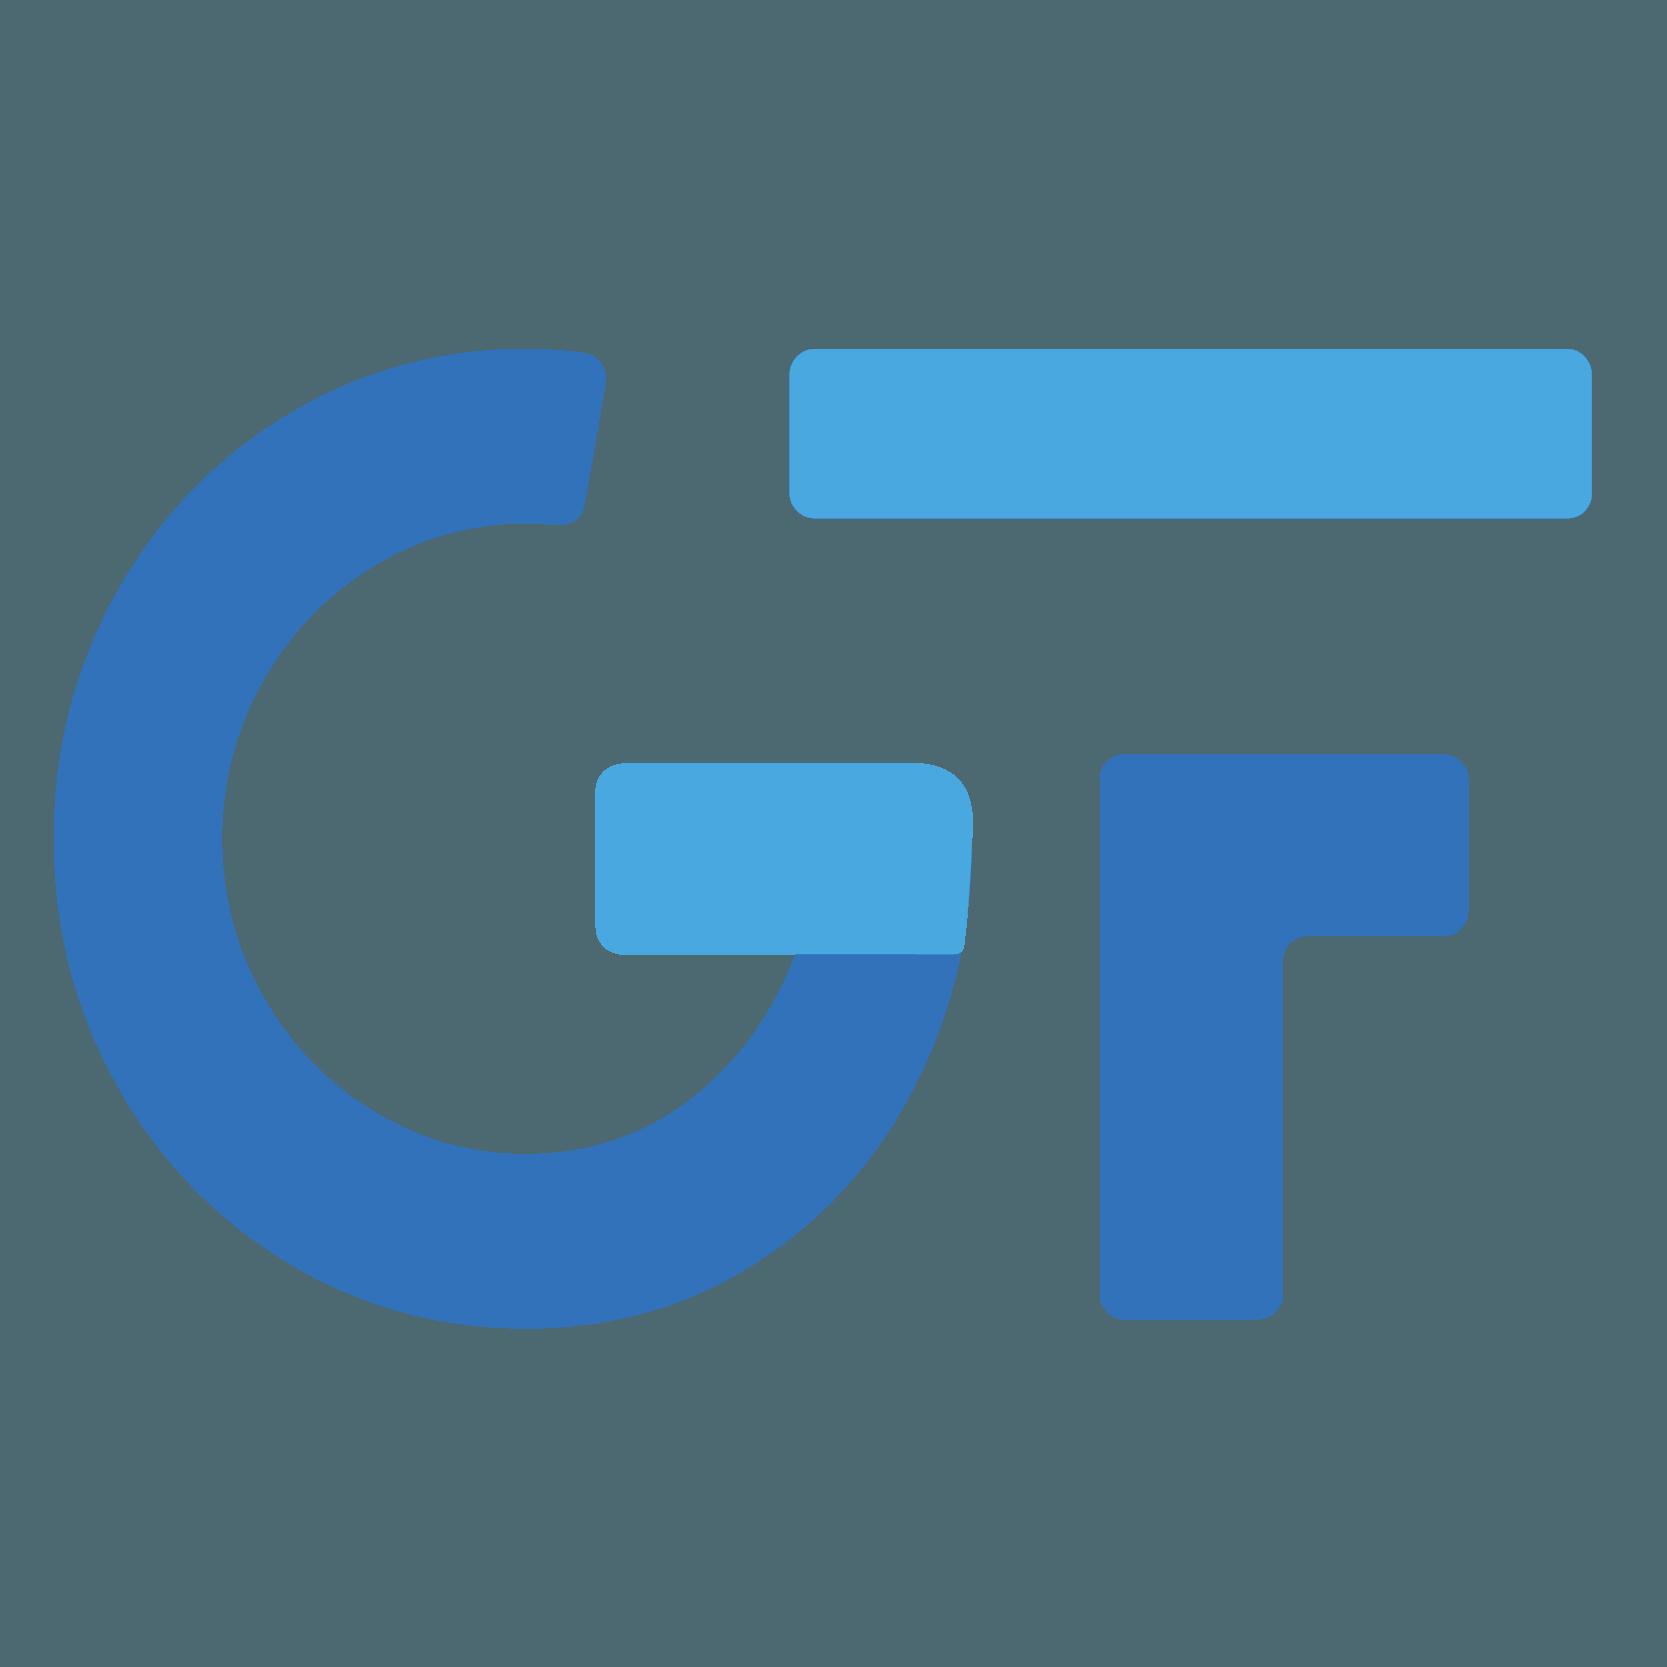 LOGO GF FT Agence web Nantes 400x400